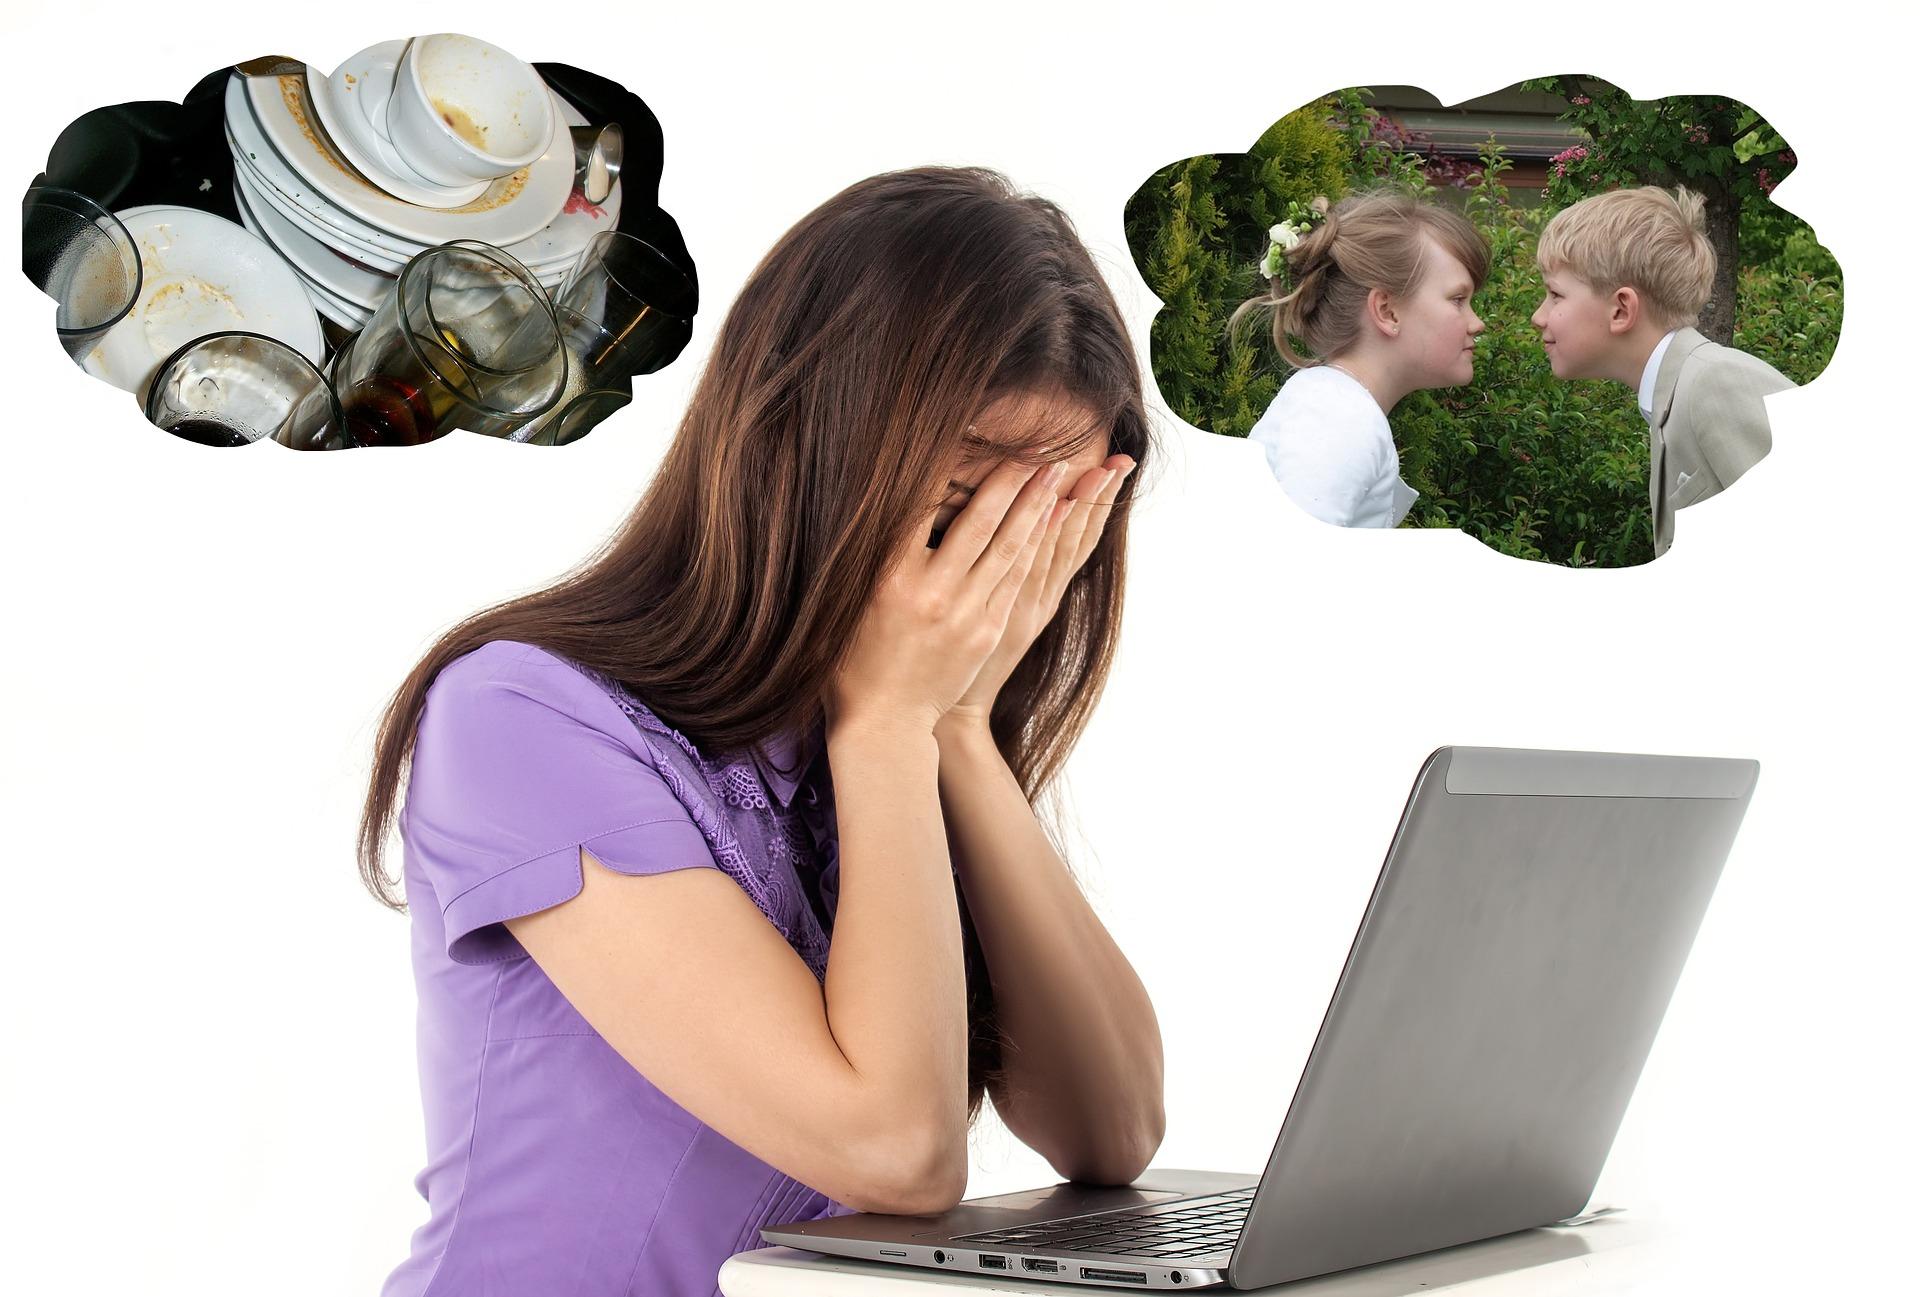 stressed-woman-3403423_1920.jpg